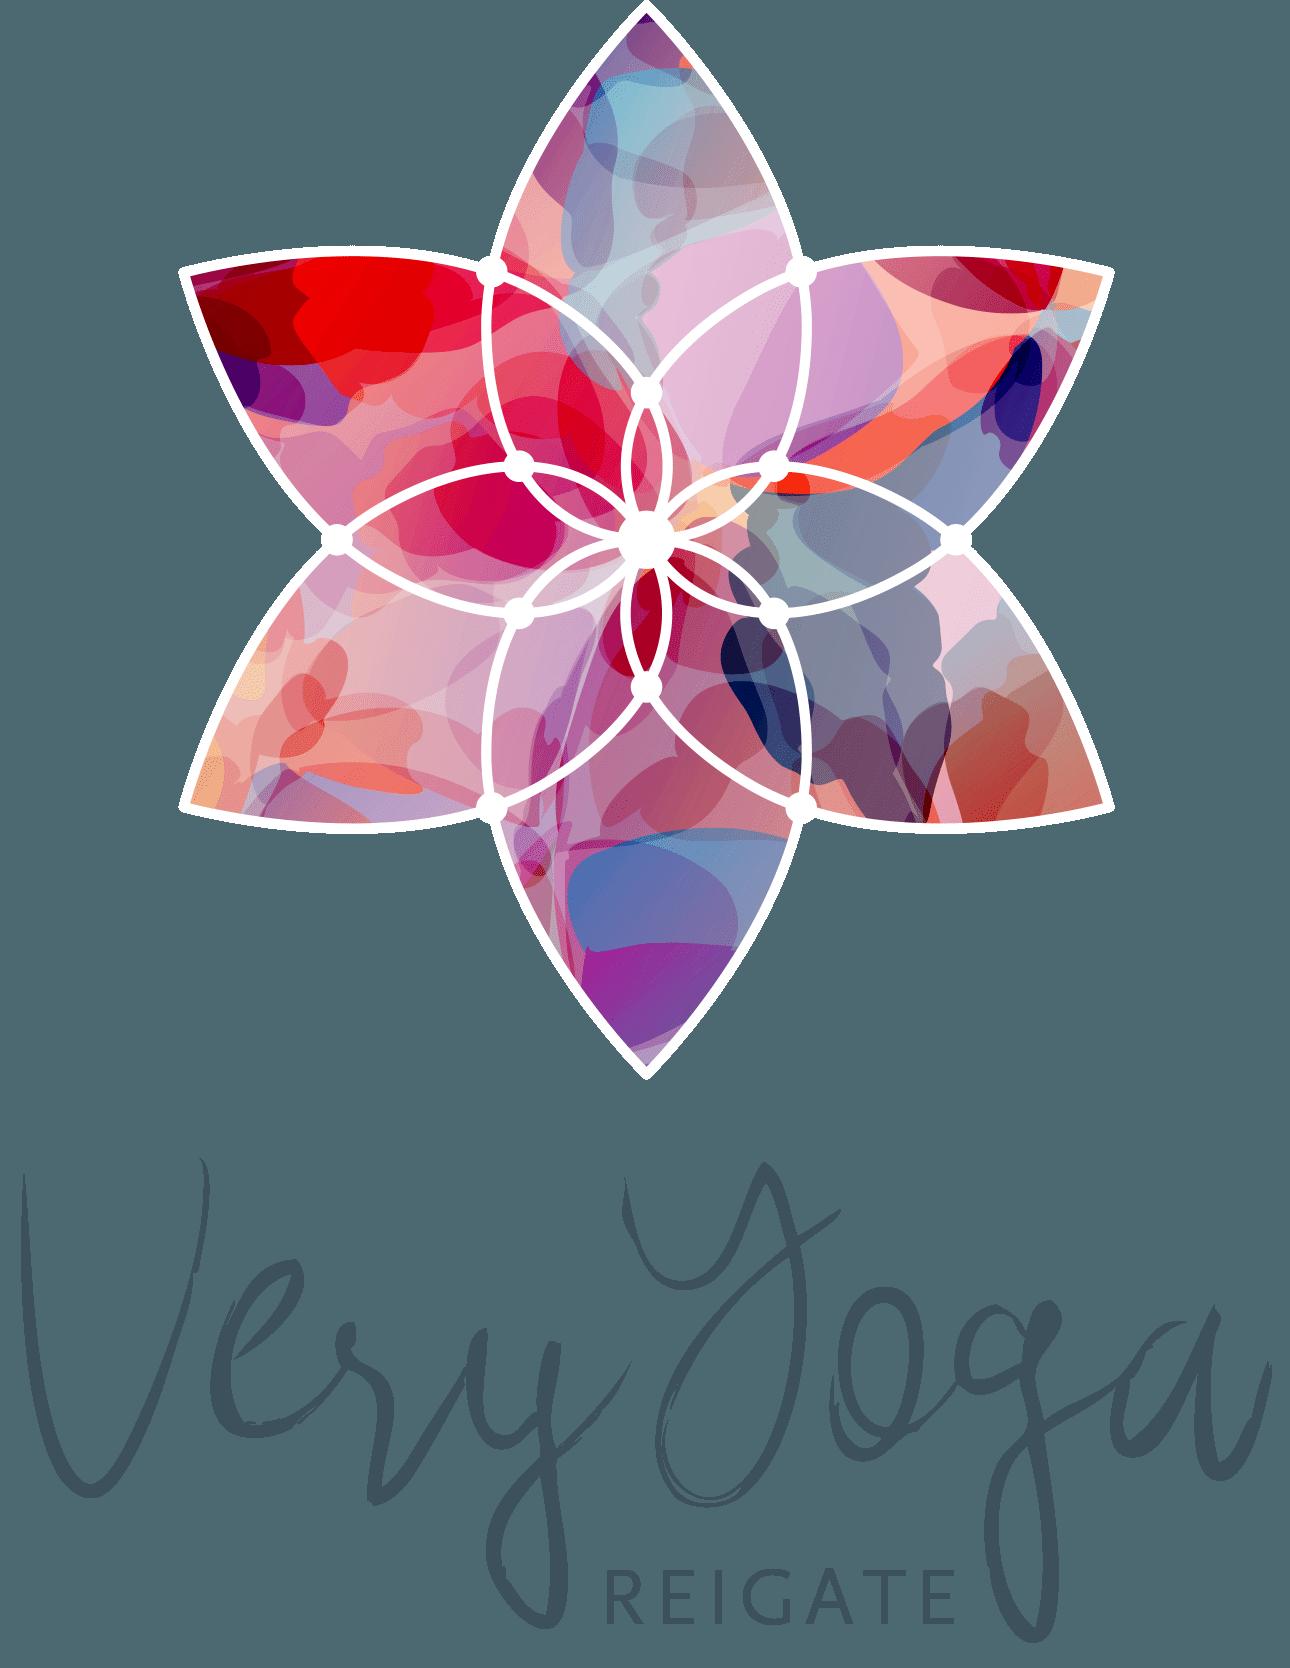 Very Yoga Reigate